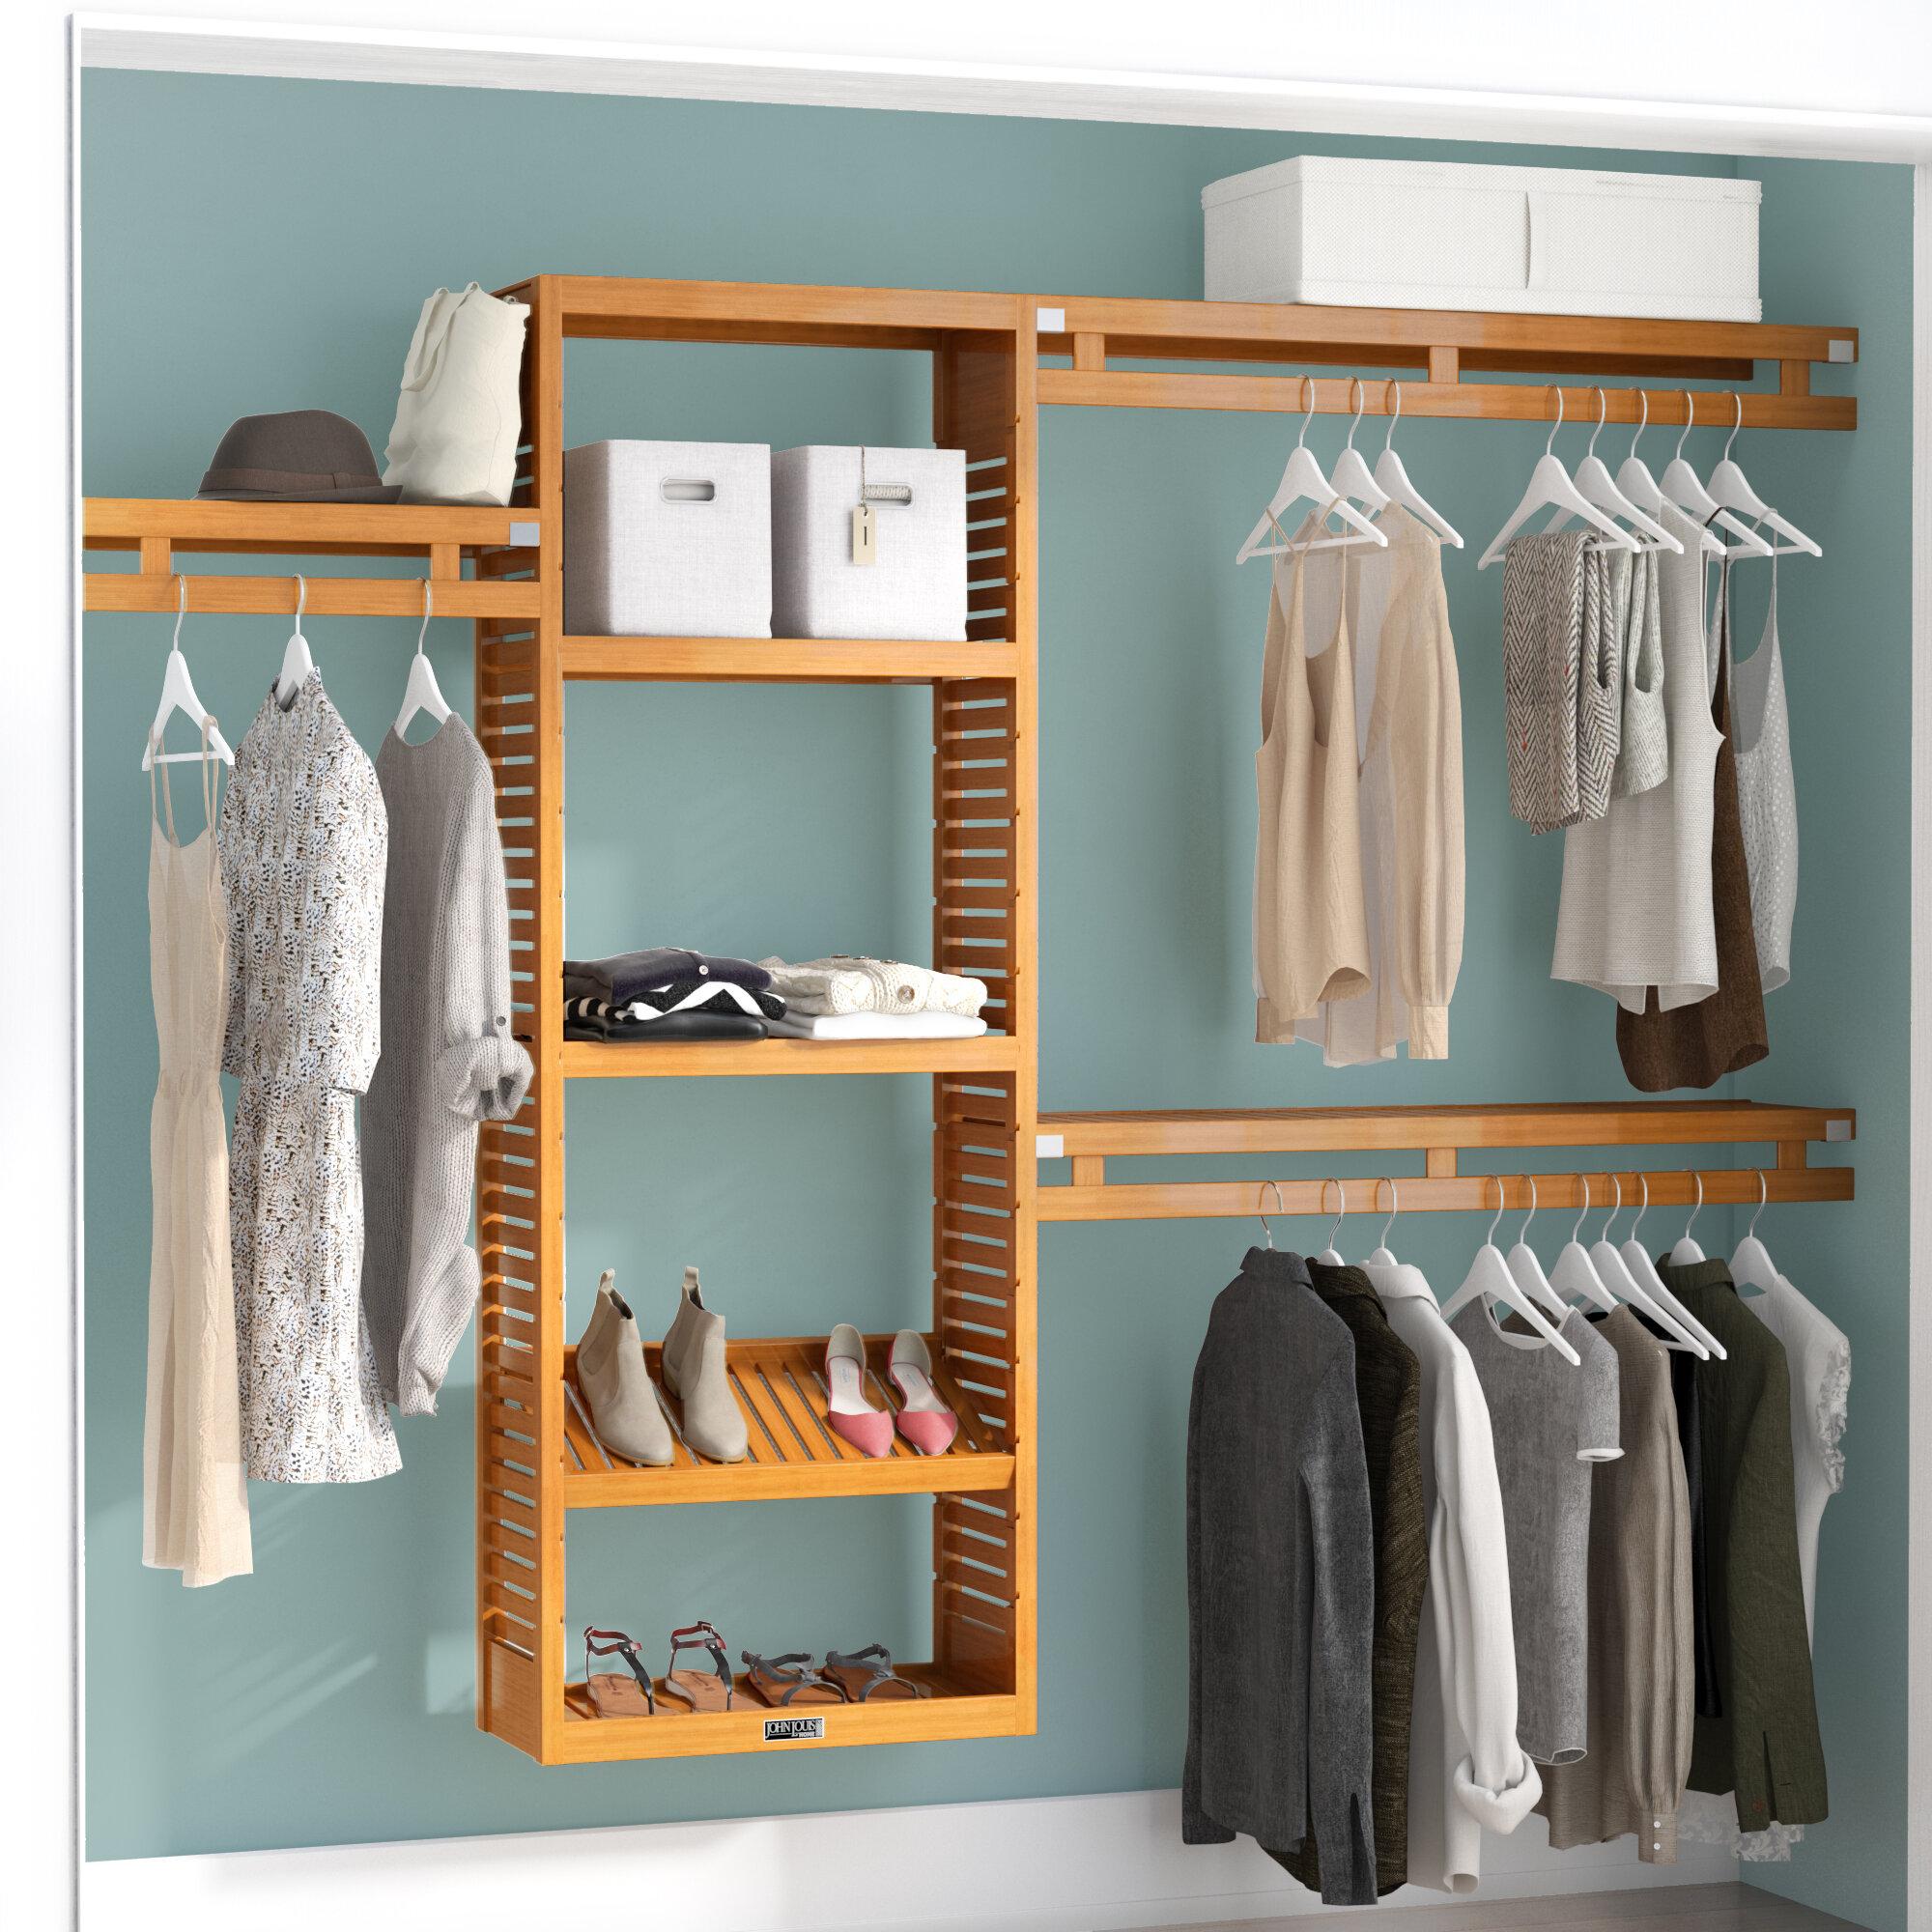 reviews organization system storage w pdx wayfair closet beachcrest navarro home